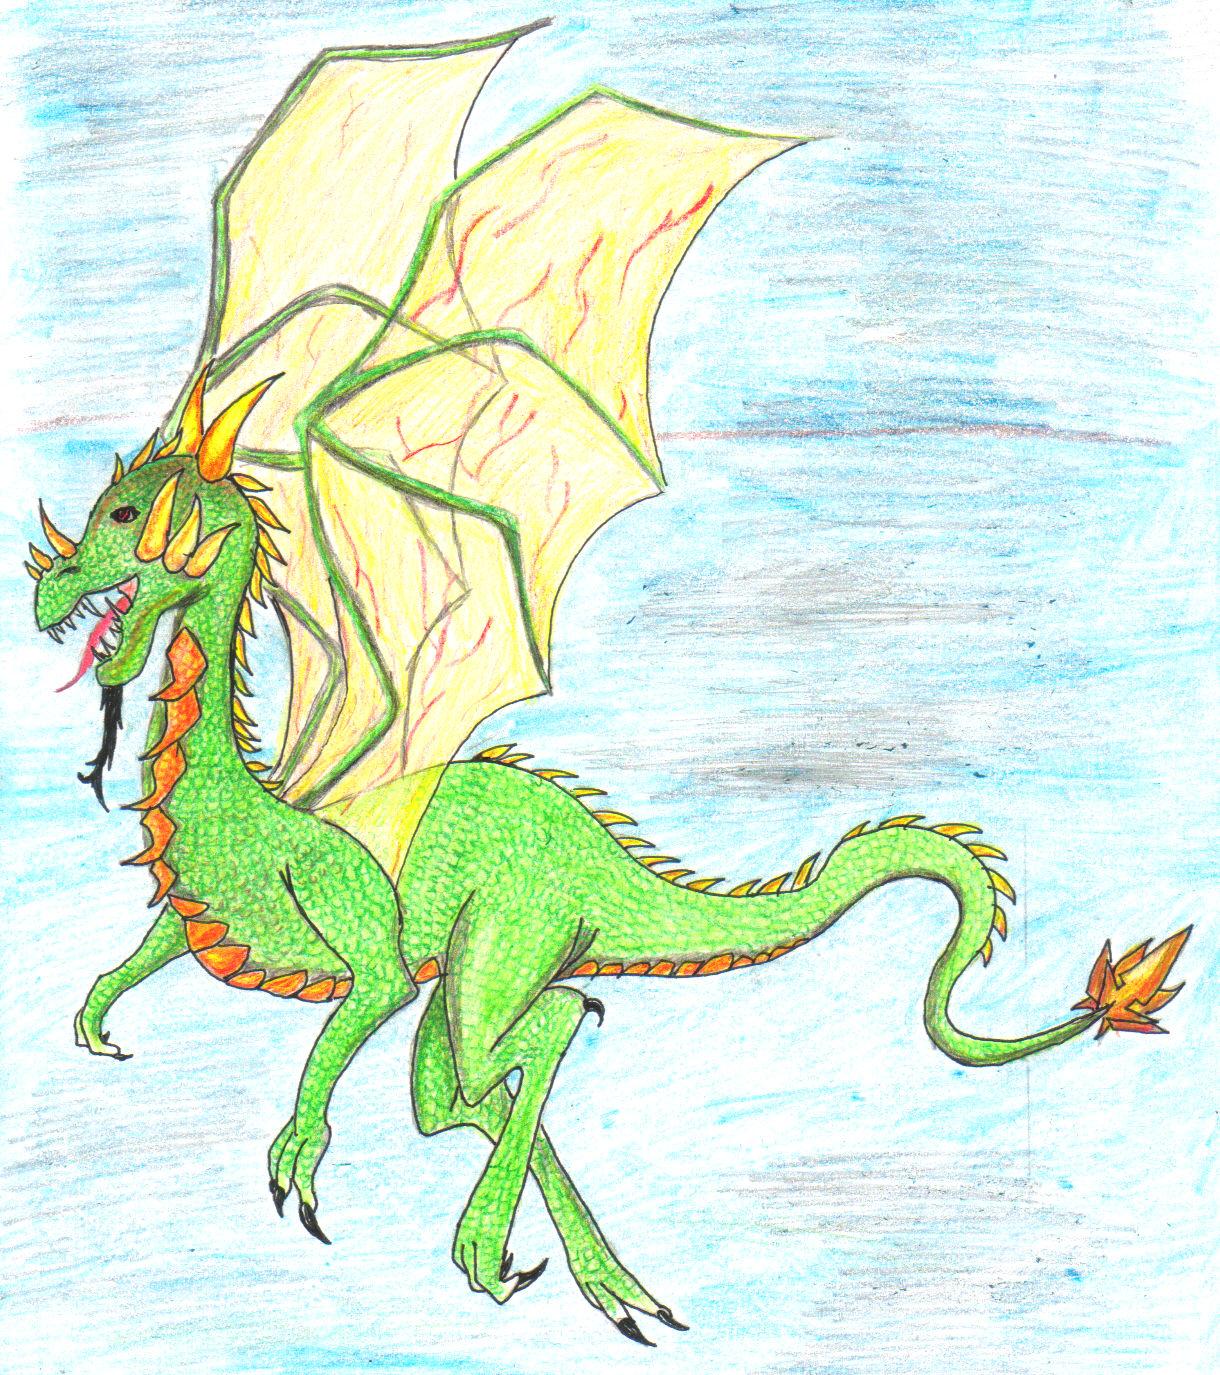 Green dragon in the sky by setzaroth